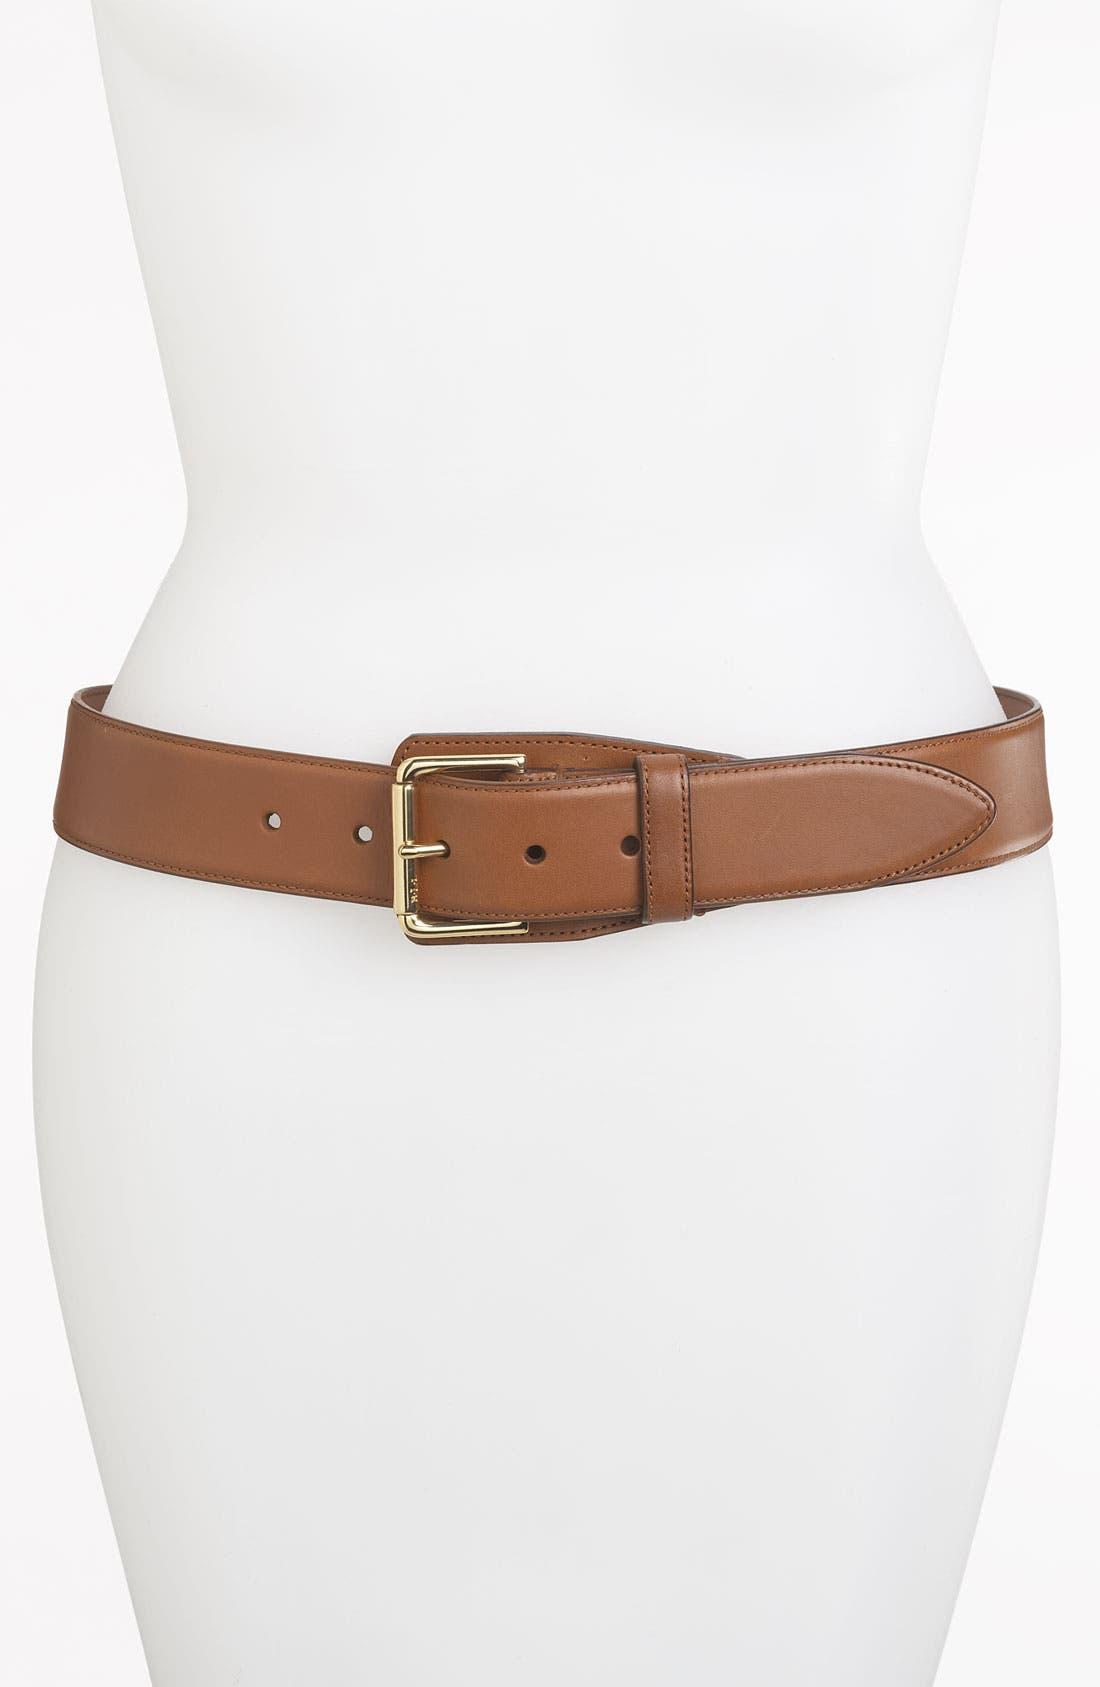 LAUREN RALPH LAUREN,                             Vachetta Leather Belt,                             Main thumbnail 1, color,                             250